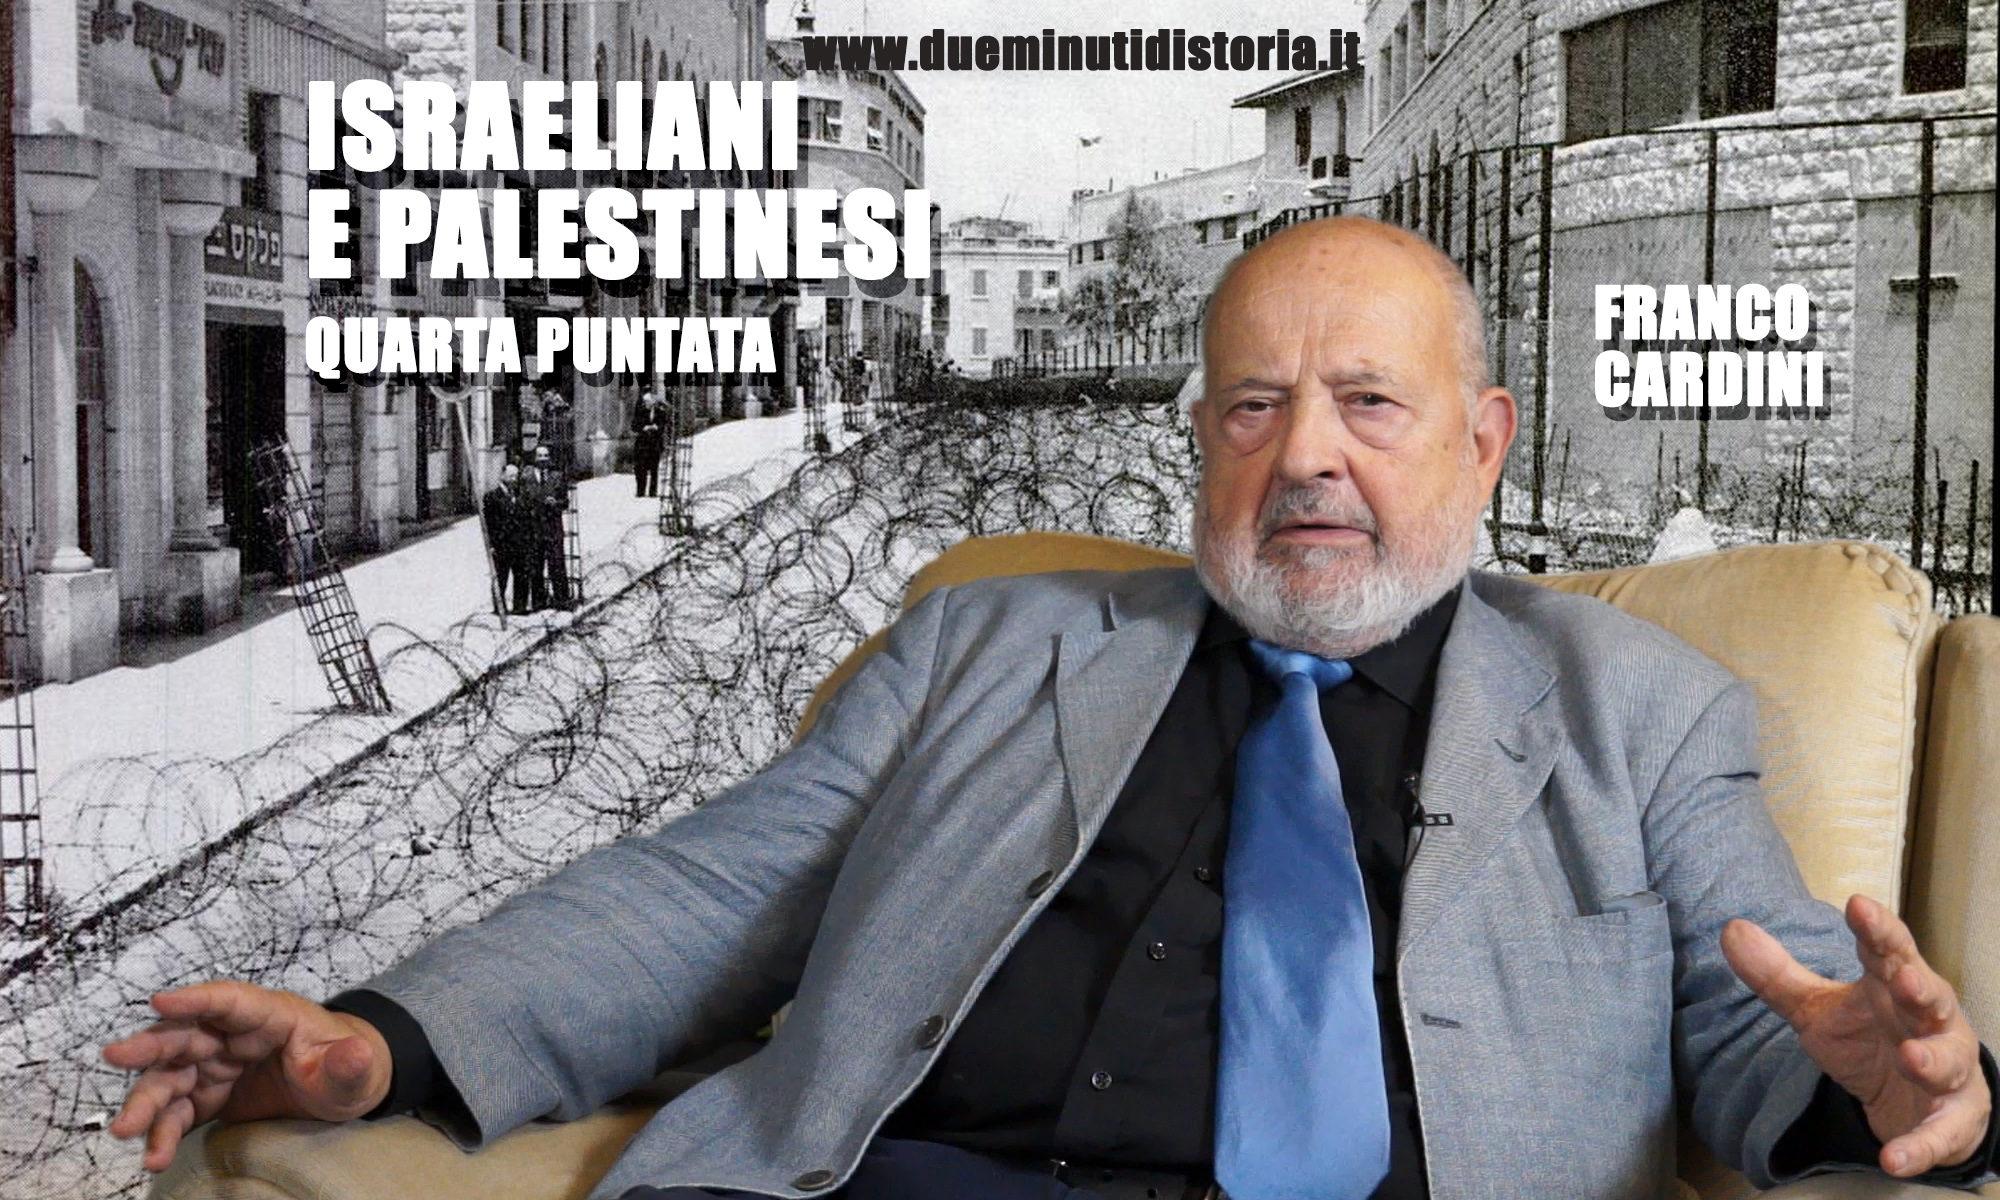 Franco Cardini: Israeliani e palestinesi